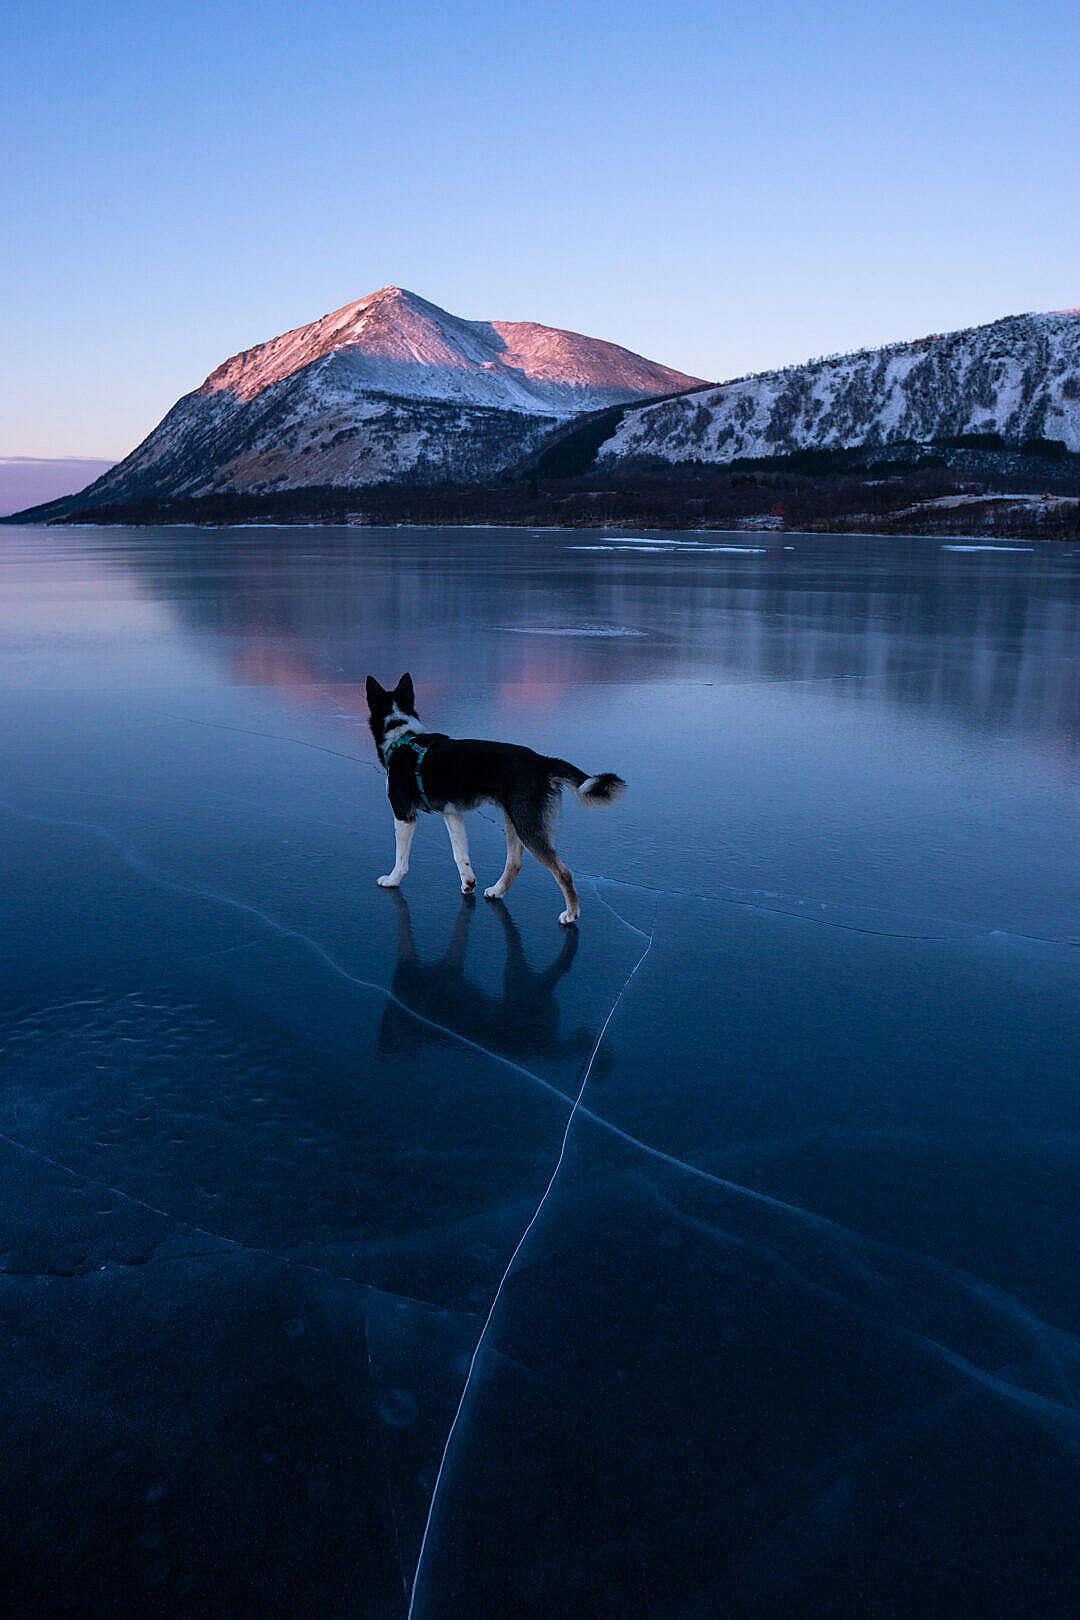 Download Husky Dog on a Frozen Lake FREE Stock Photo